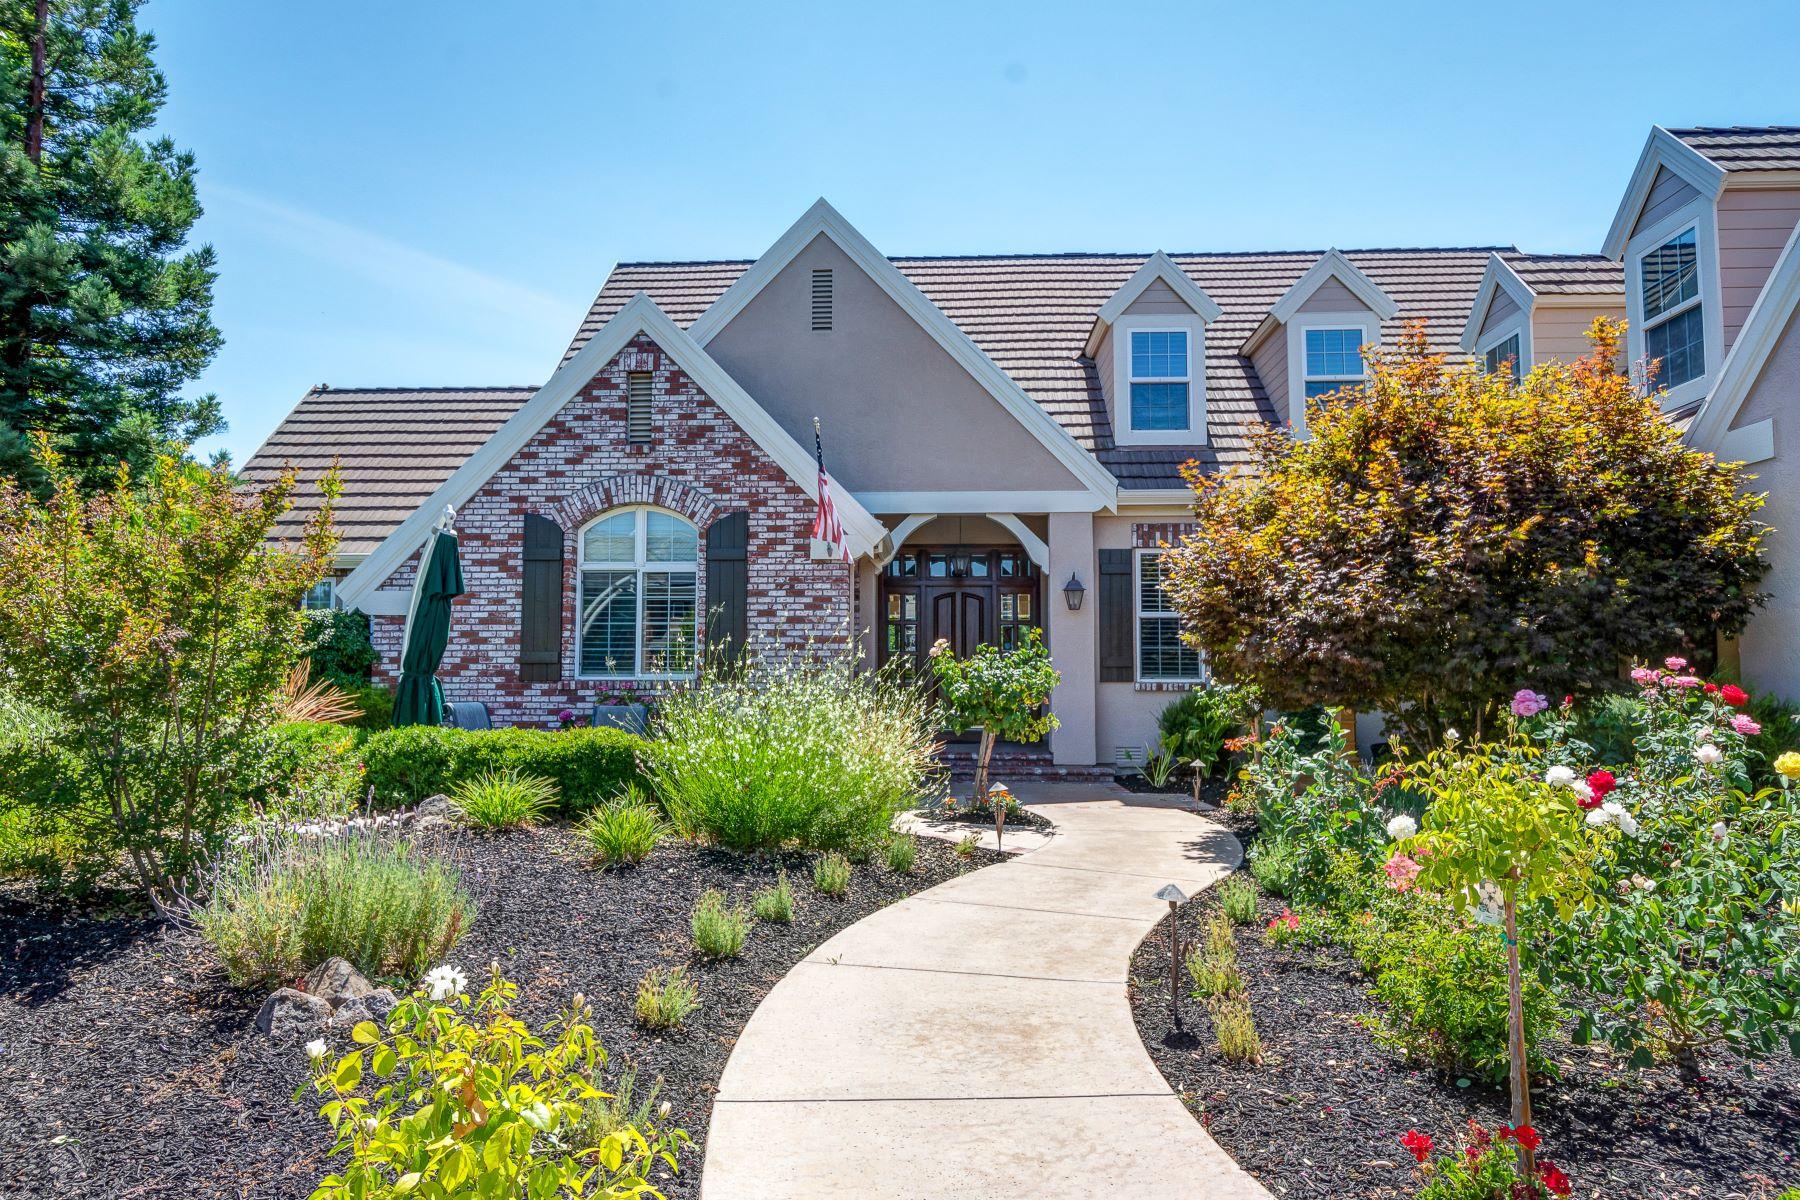 Single Family Homes por un Venta en 1018 Vía Di Salerno, Pleasanton, CA 94566 1018 Vía Di Salerno Pleasanton, California 94566 Estados Unidos